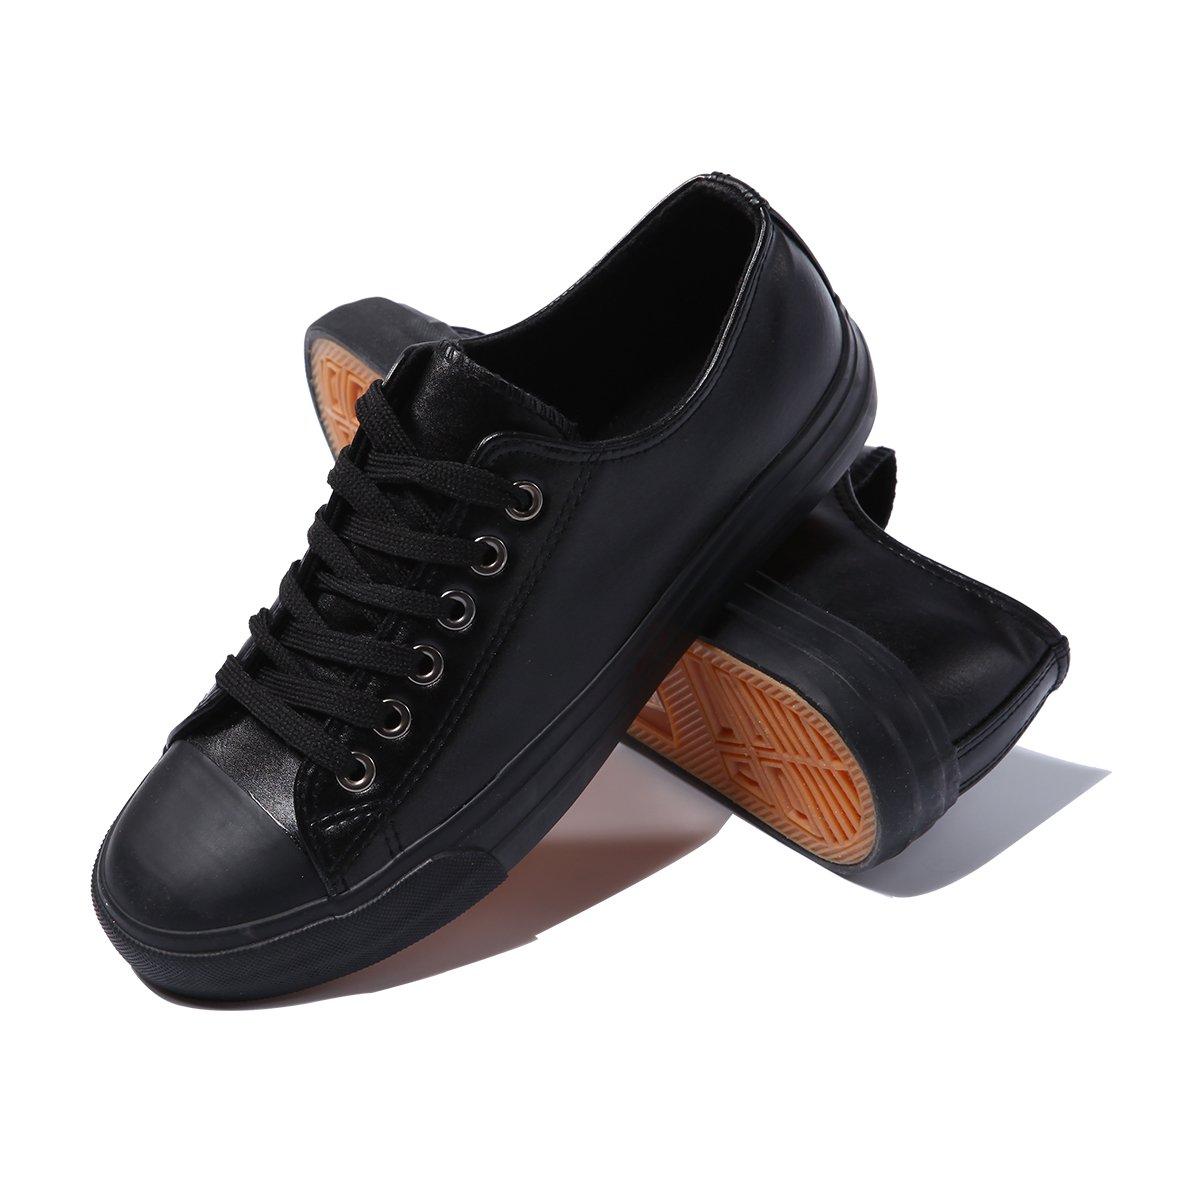 AOMAIS Womens PU Canvas Shoes Sneaker Low Top Lace up Fashion Walking Shoes (Black, US9) …